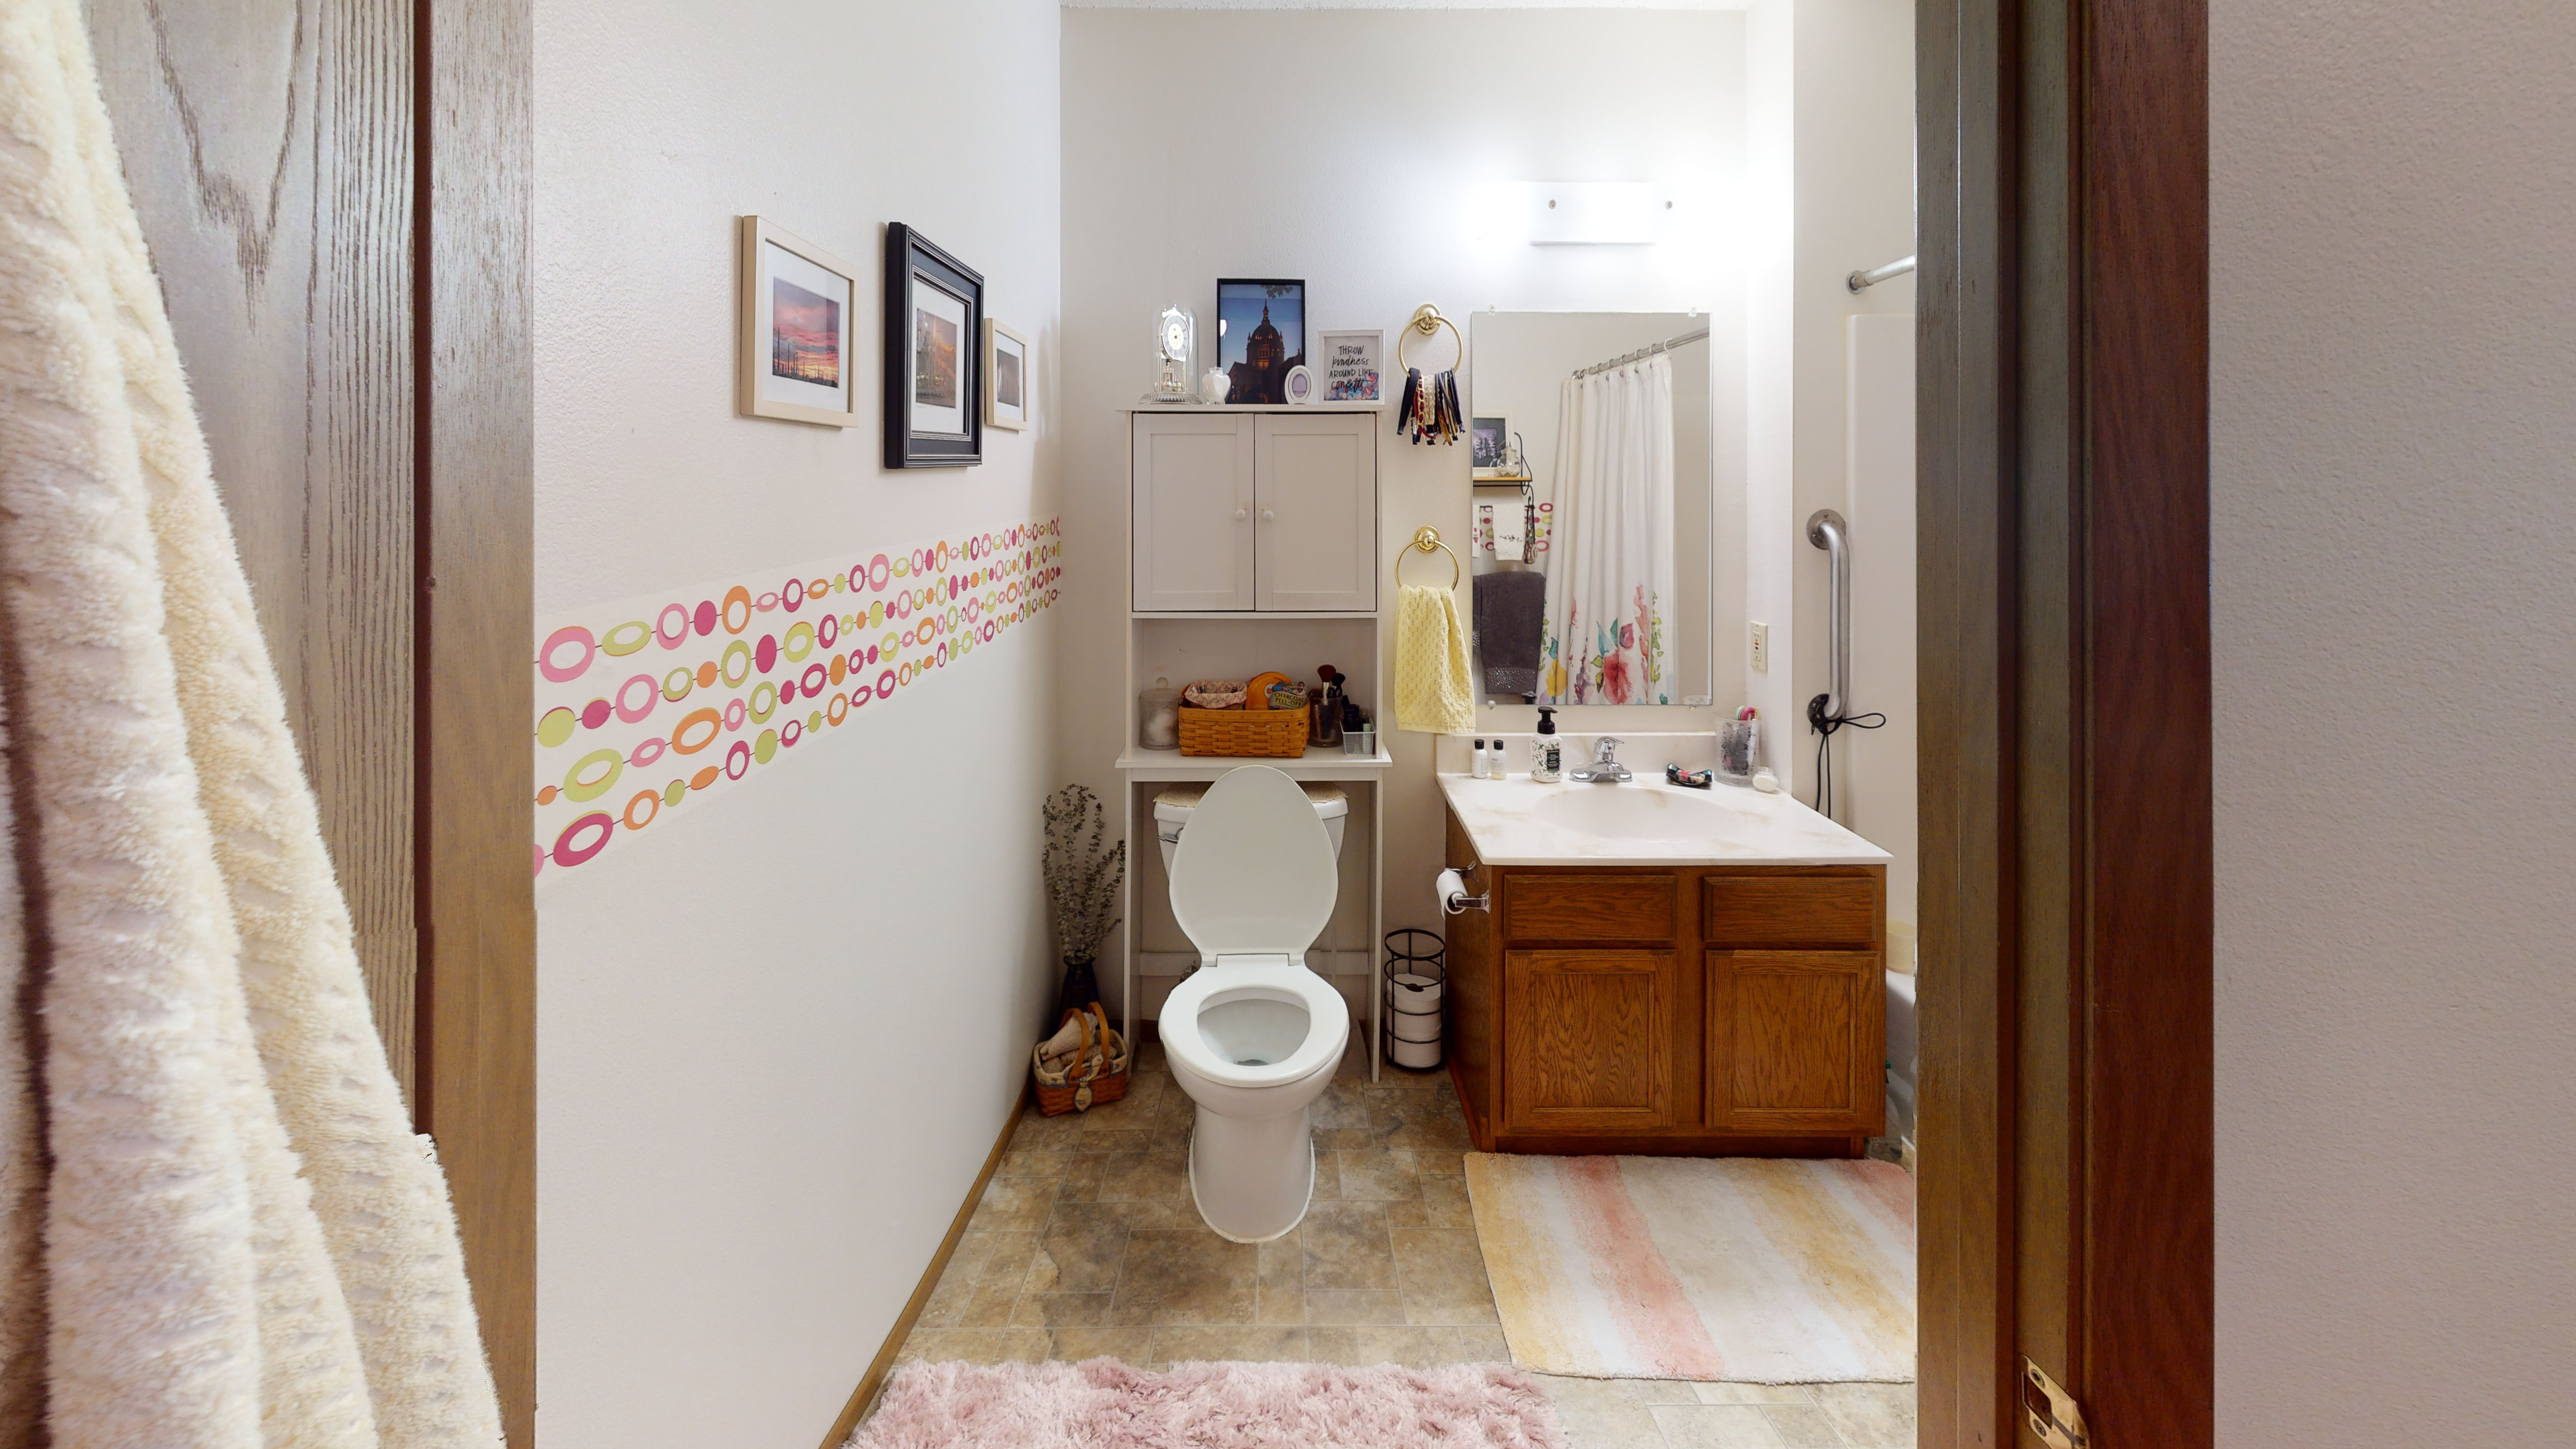 Cottages-of-Aspen-2-Bedroom-1-Bathroom-B